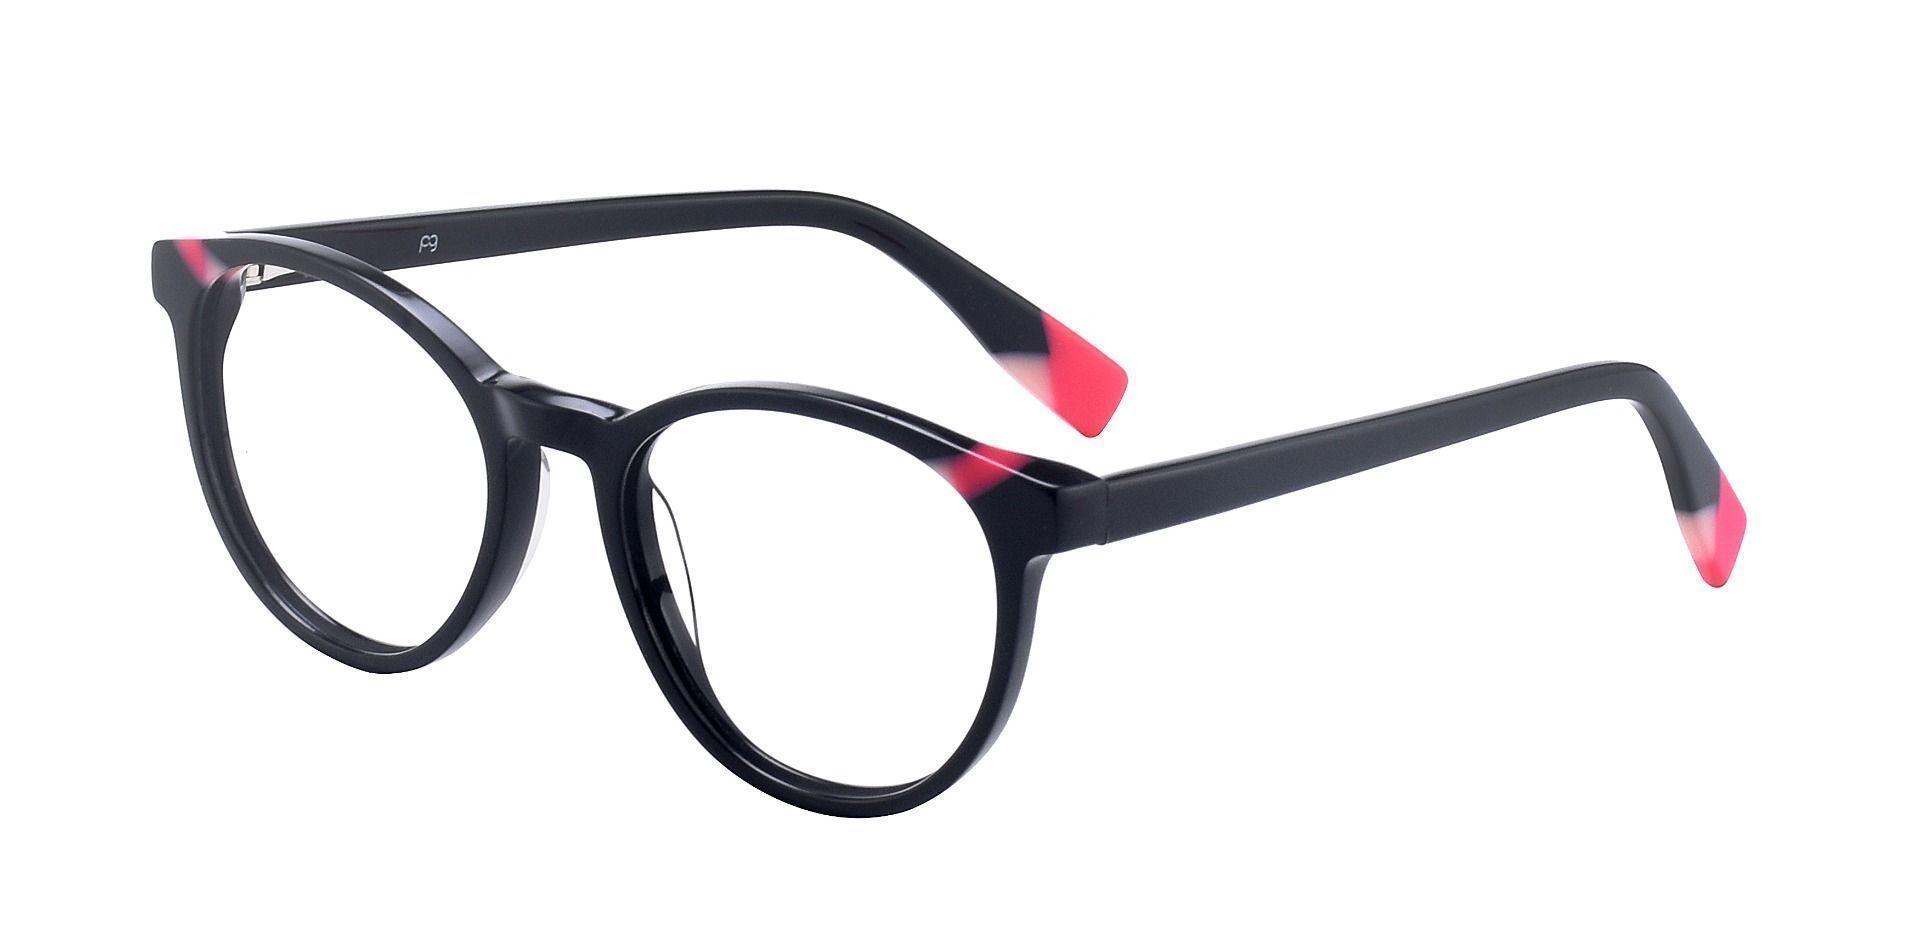 Odette Oval Progressive Glasses - The Frame Is Black And Red